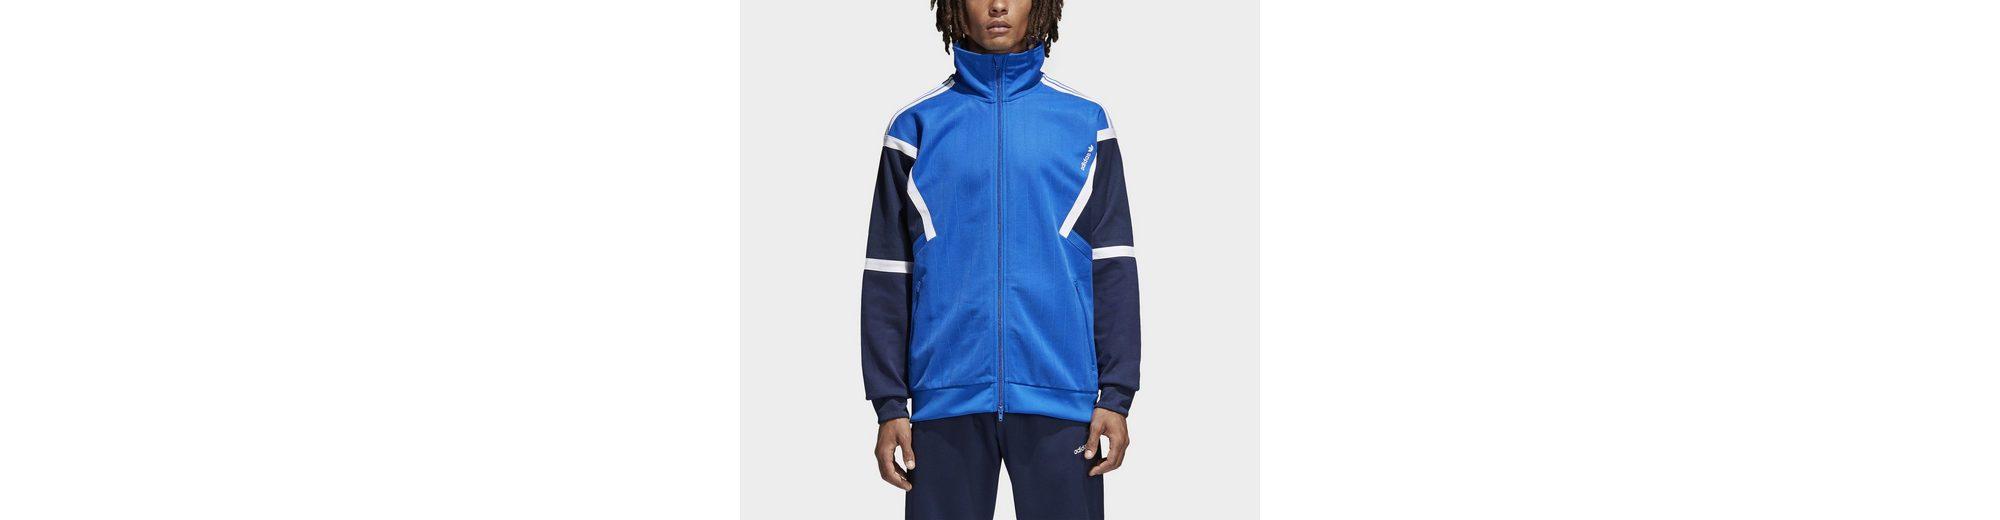 adidas Originals Sweatjacke Training Originals Jacke